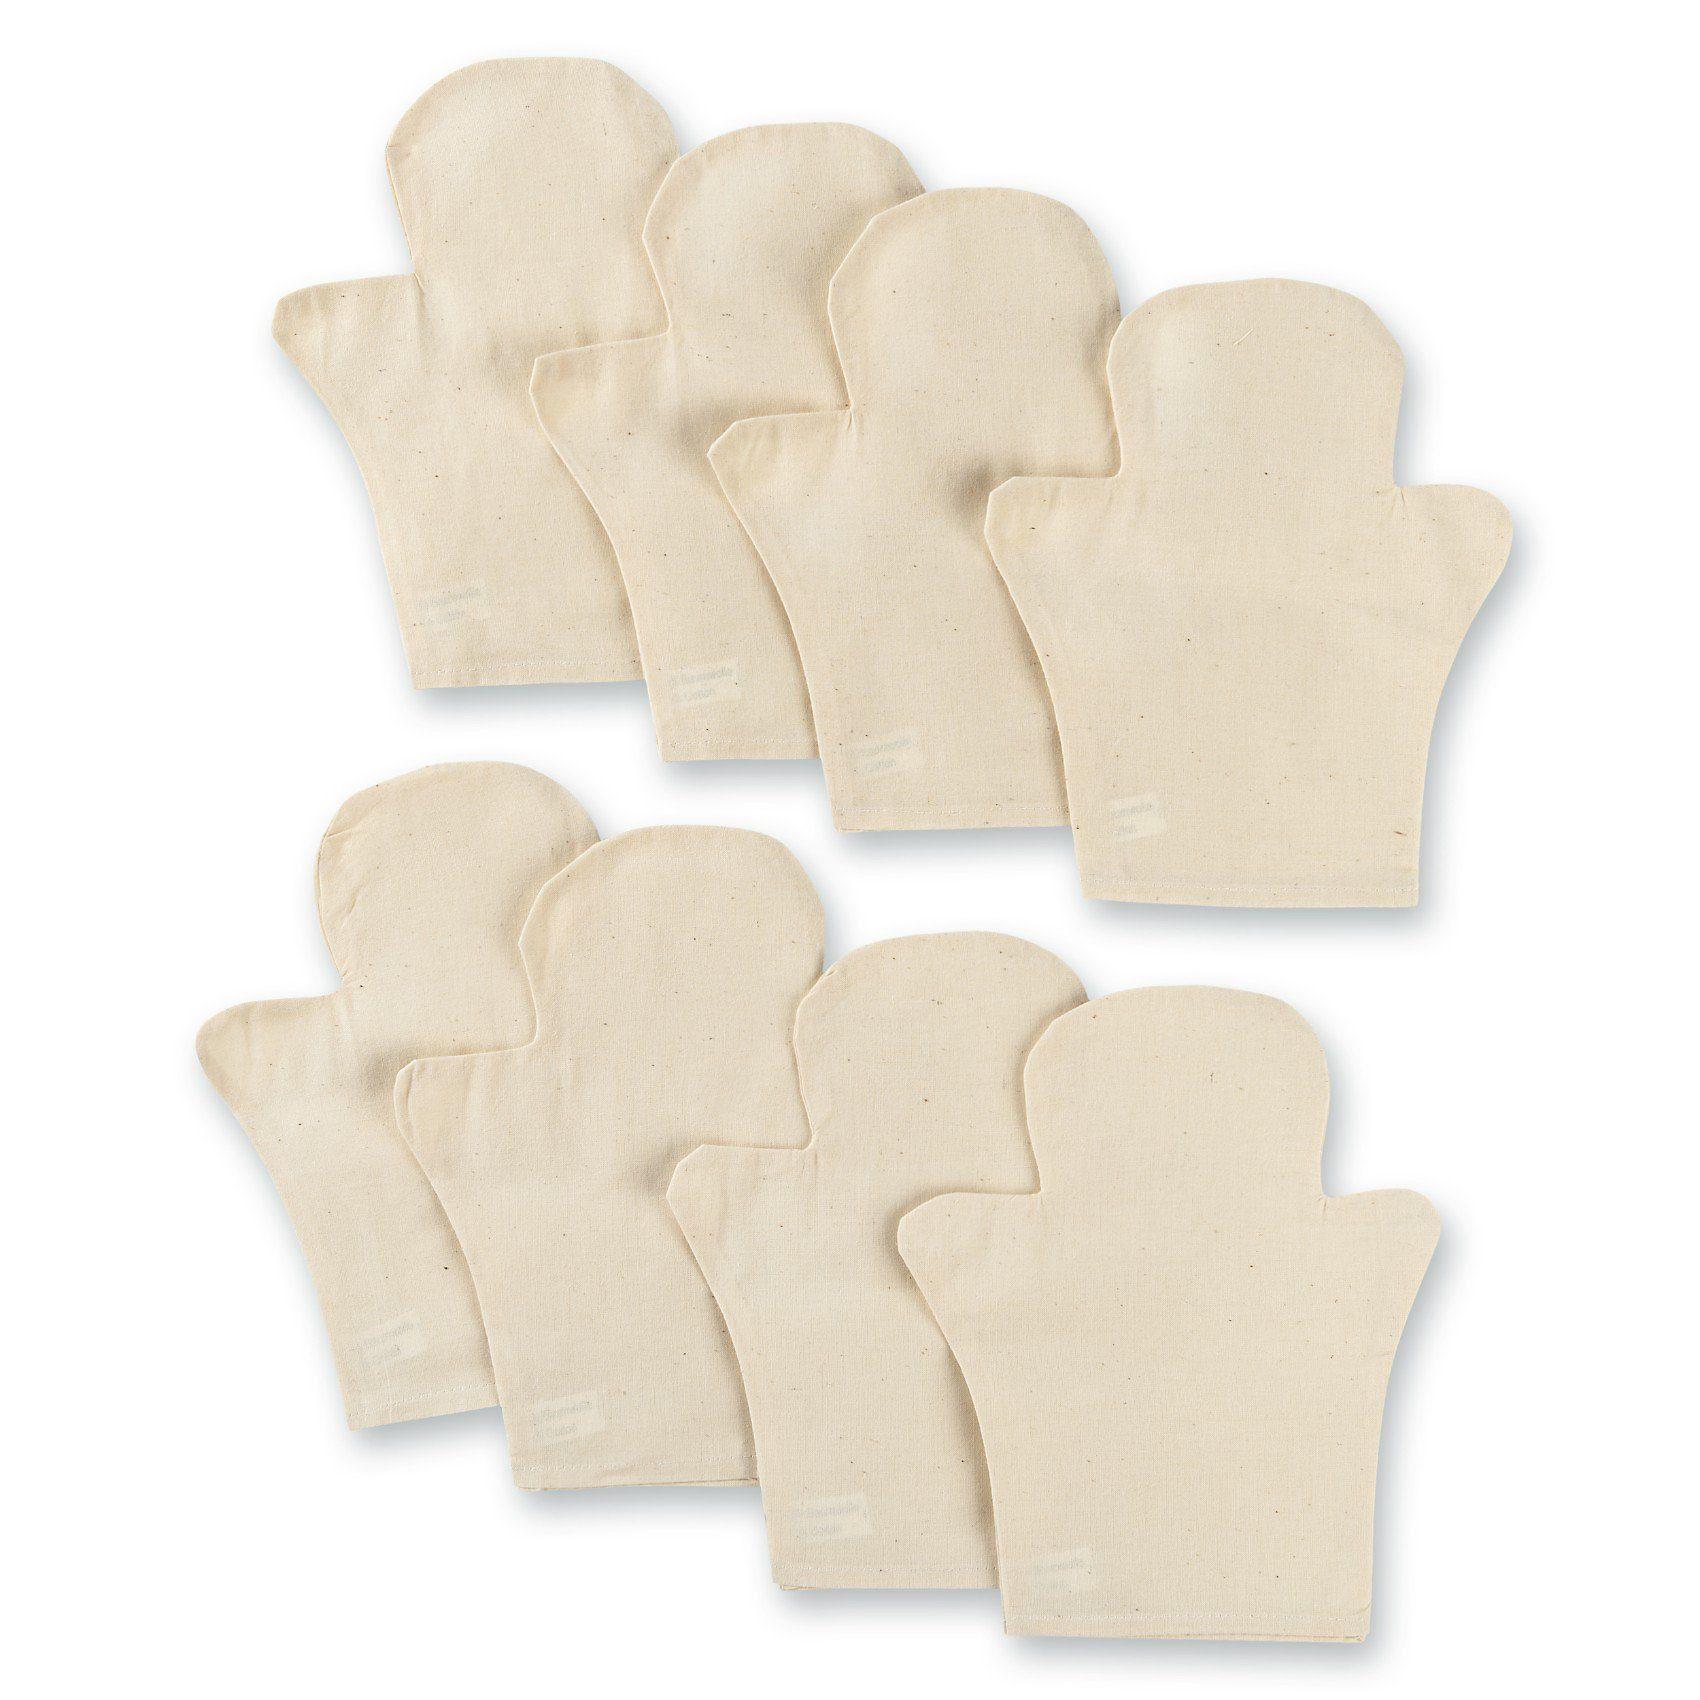 prohobb Blanko-Handpuppen zum Selbstgestalten, 8 Stück